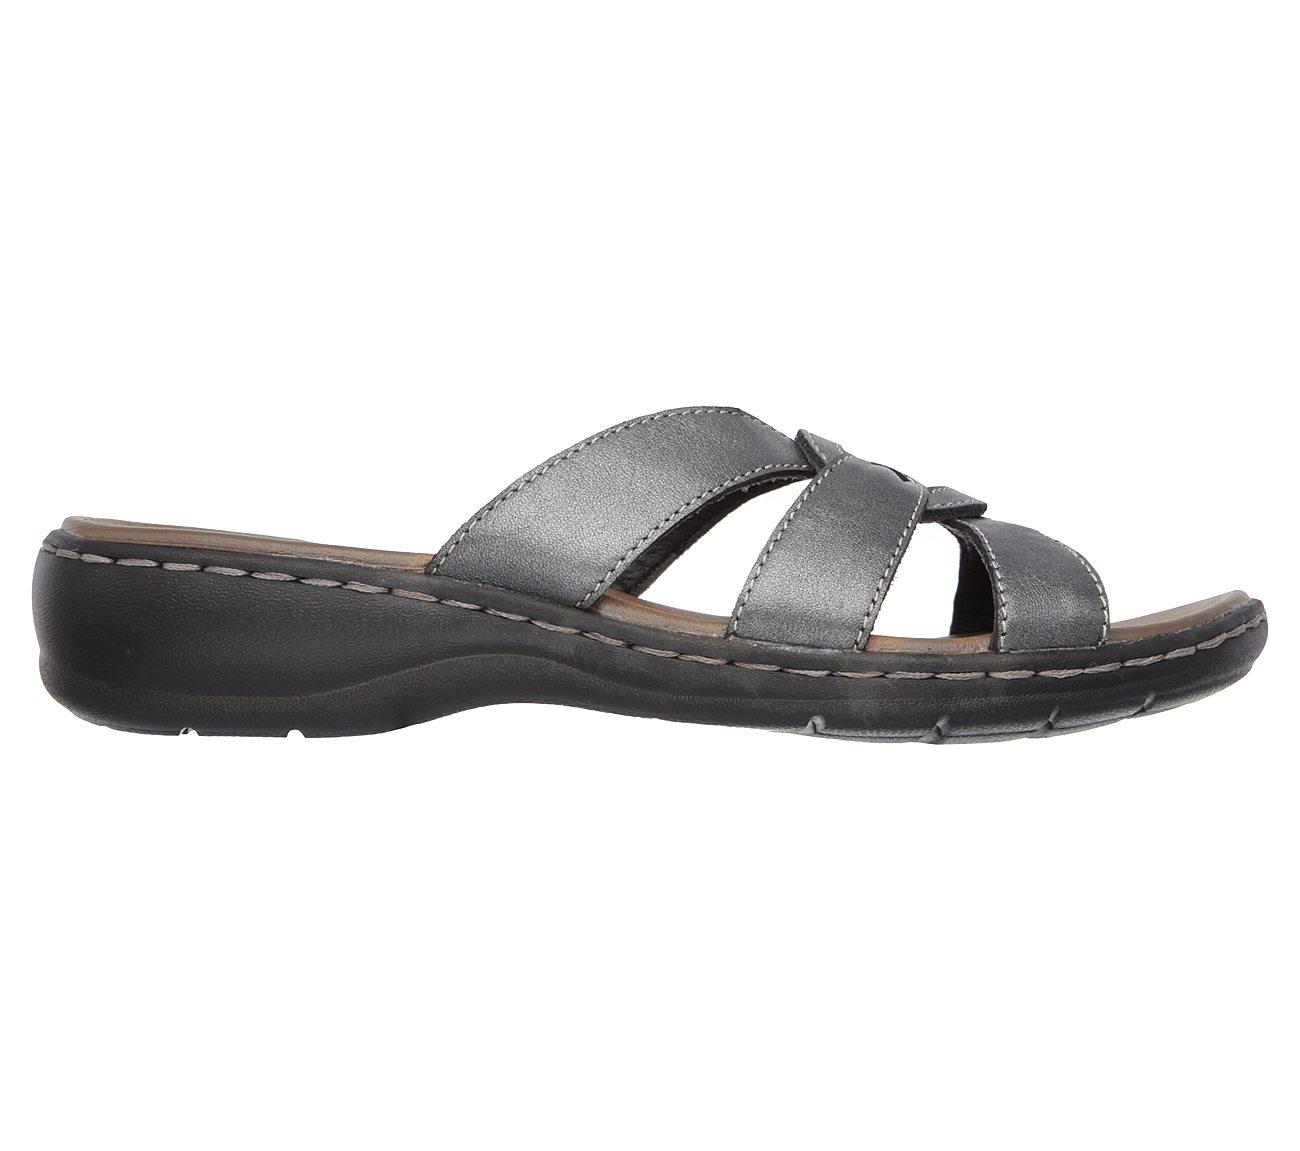 47bf2ba4beb5 Buy SKECHERS Passenger - Getaway Modern Comfort Shoes only 55